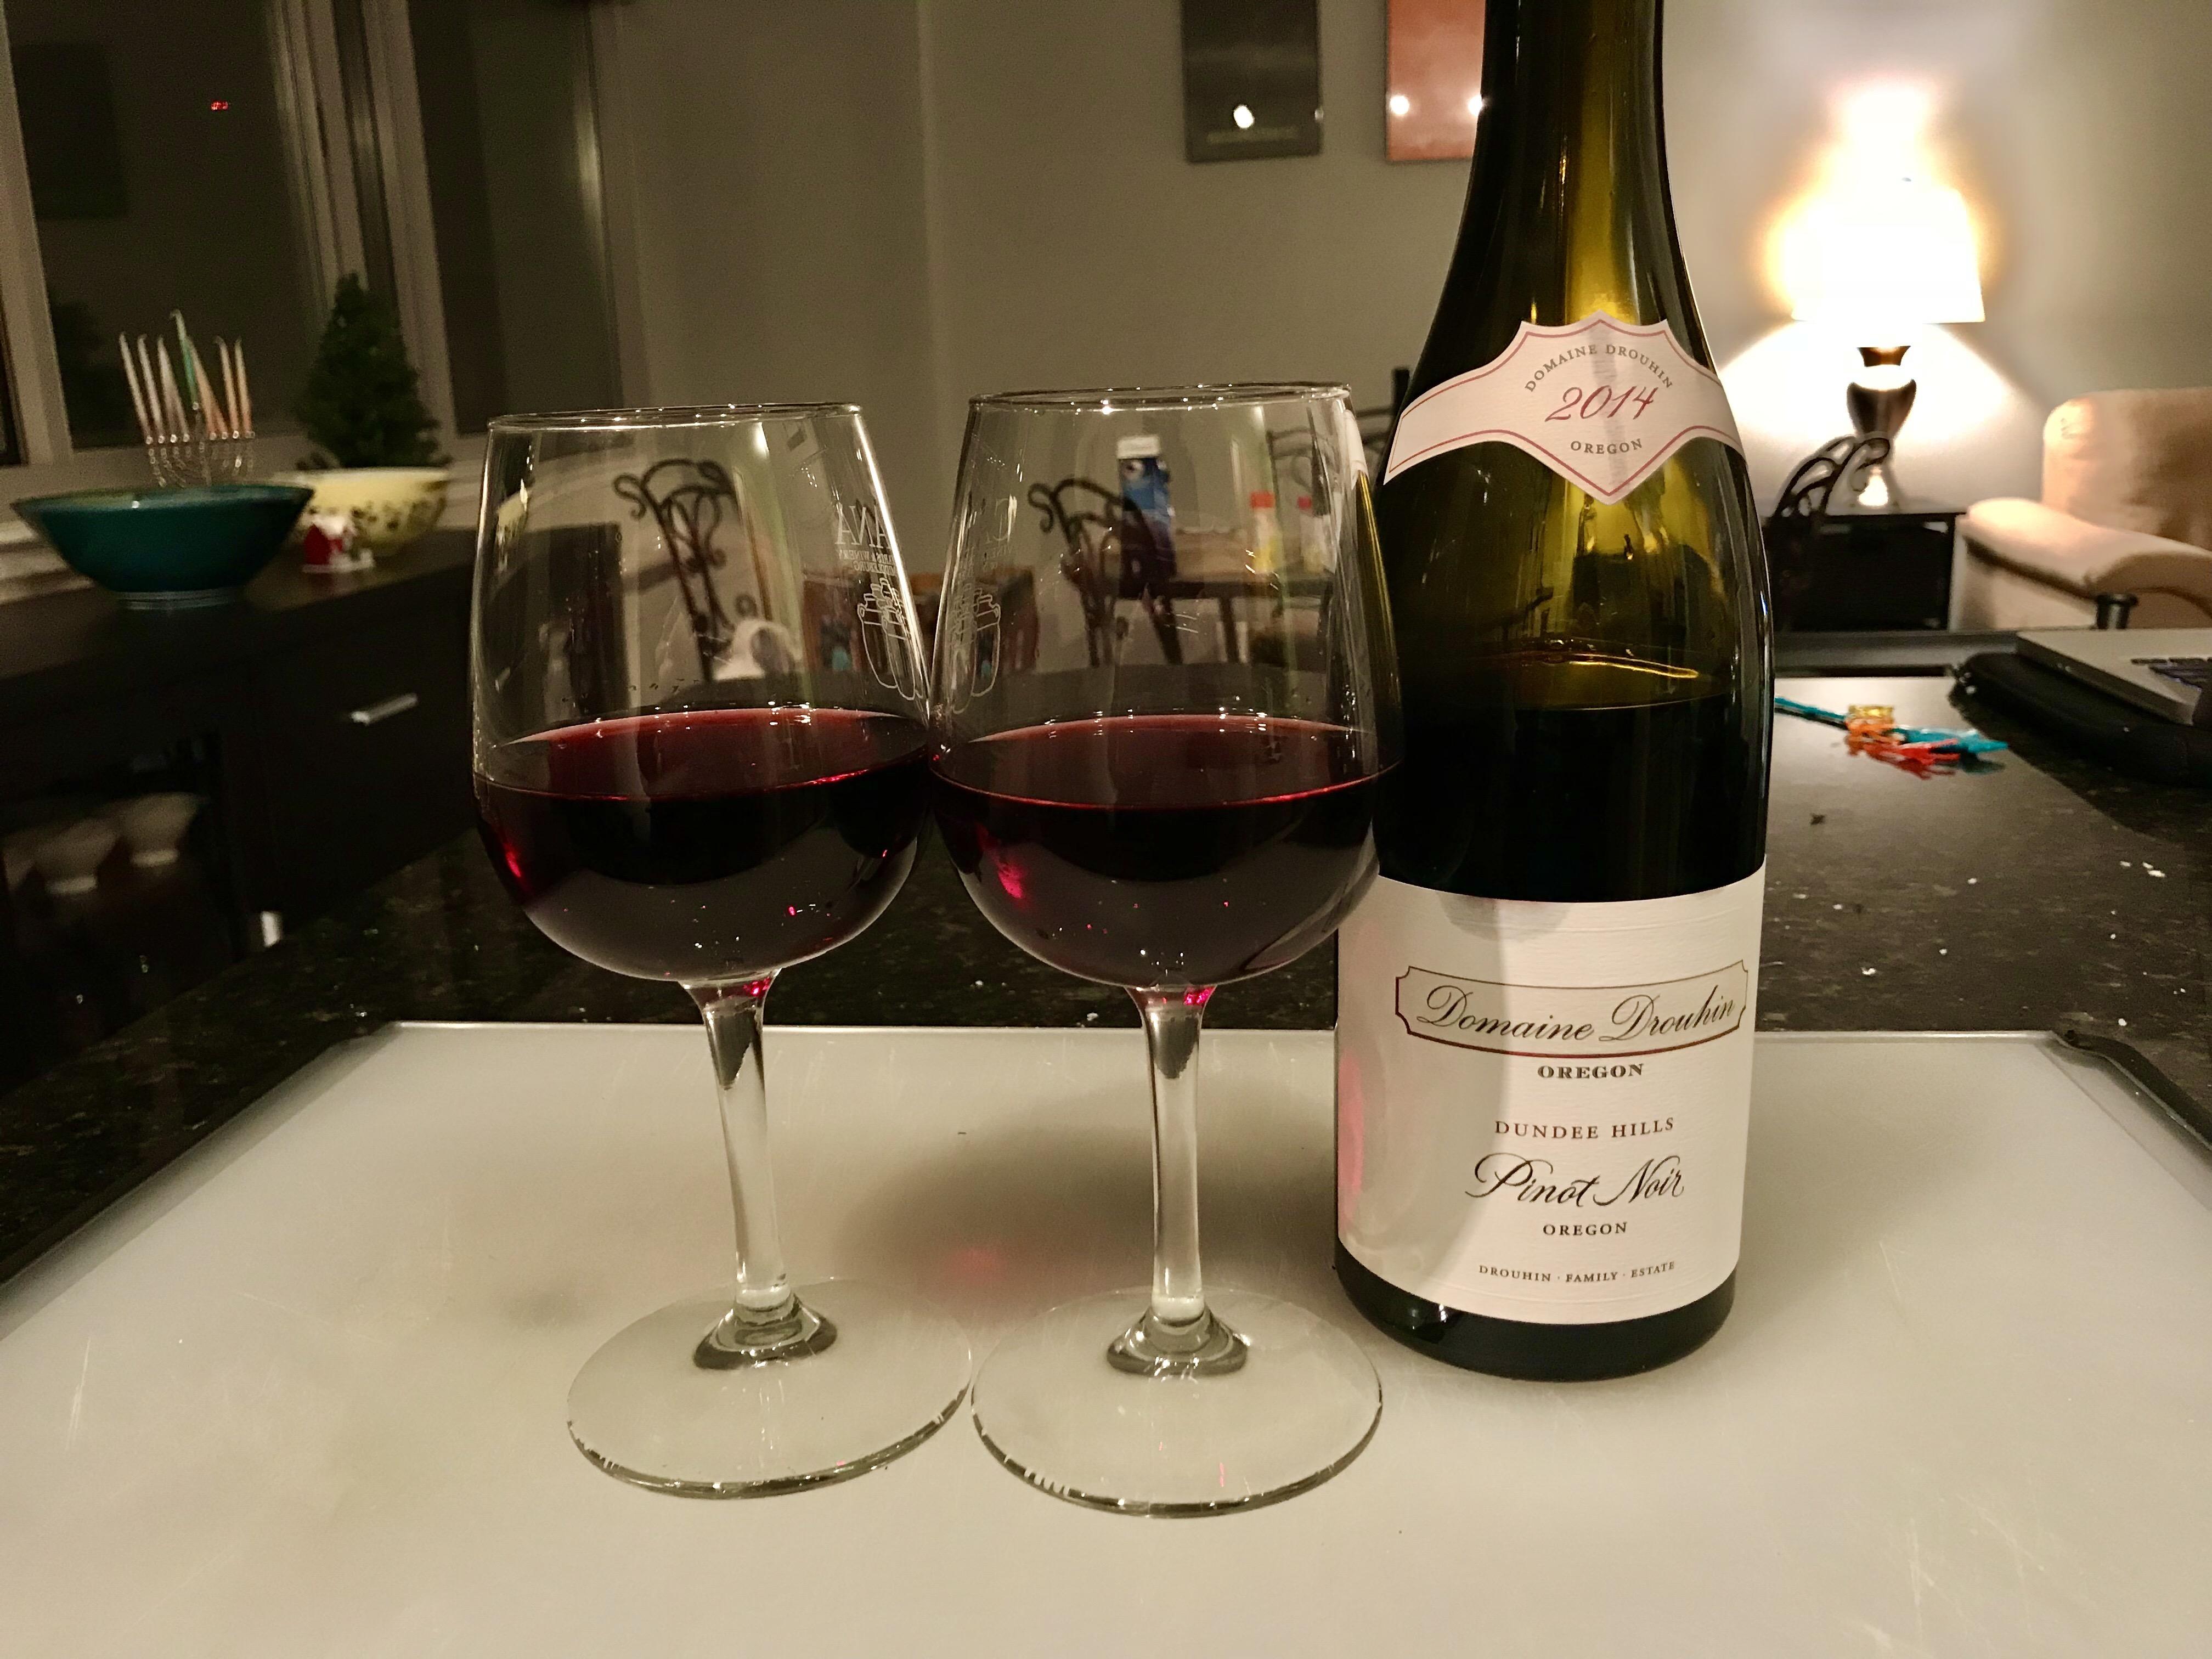 2014 Domaine Drouhin Dundee Hills Pinot Noir wine